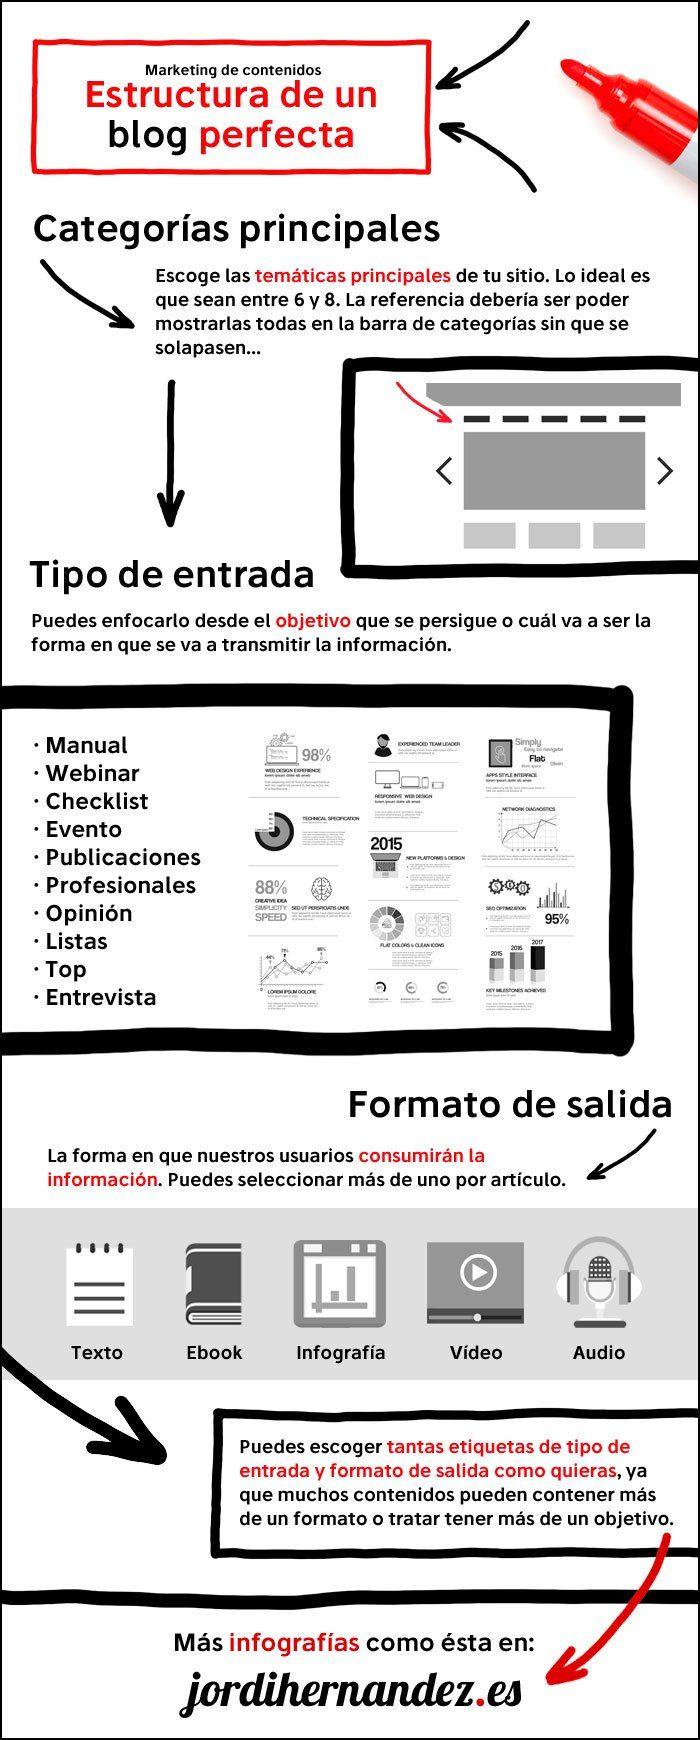 Cómo debe ser la Estructura perfecta de un Blog #infografia #infographic…